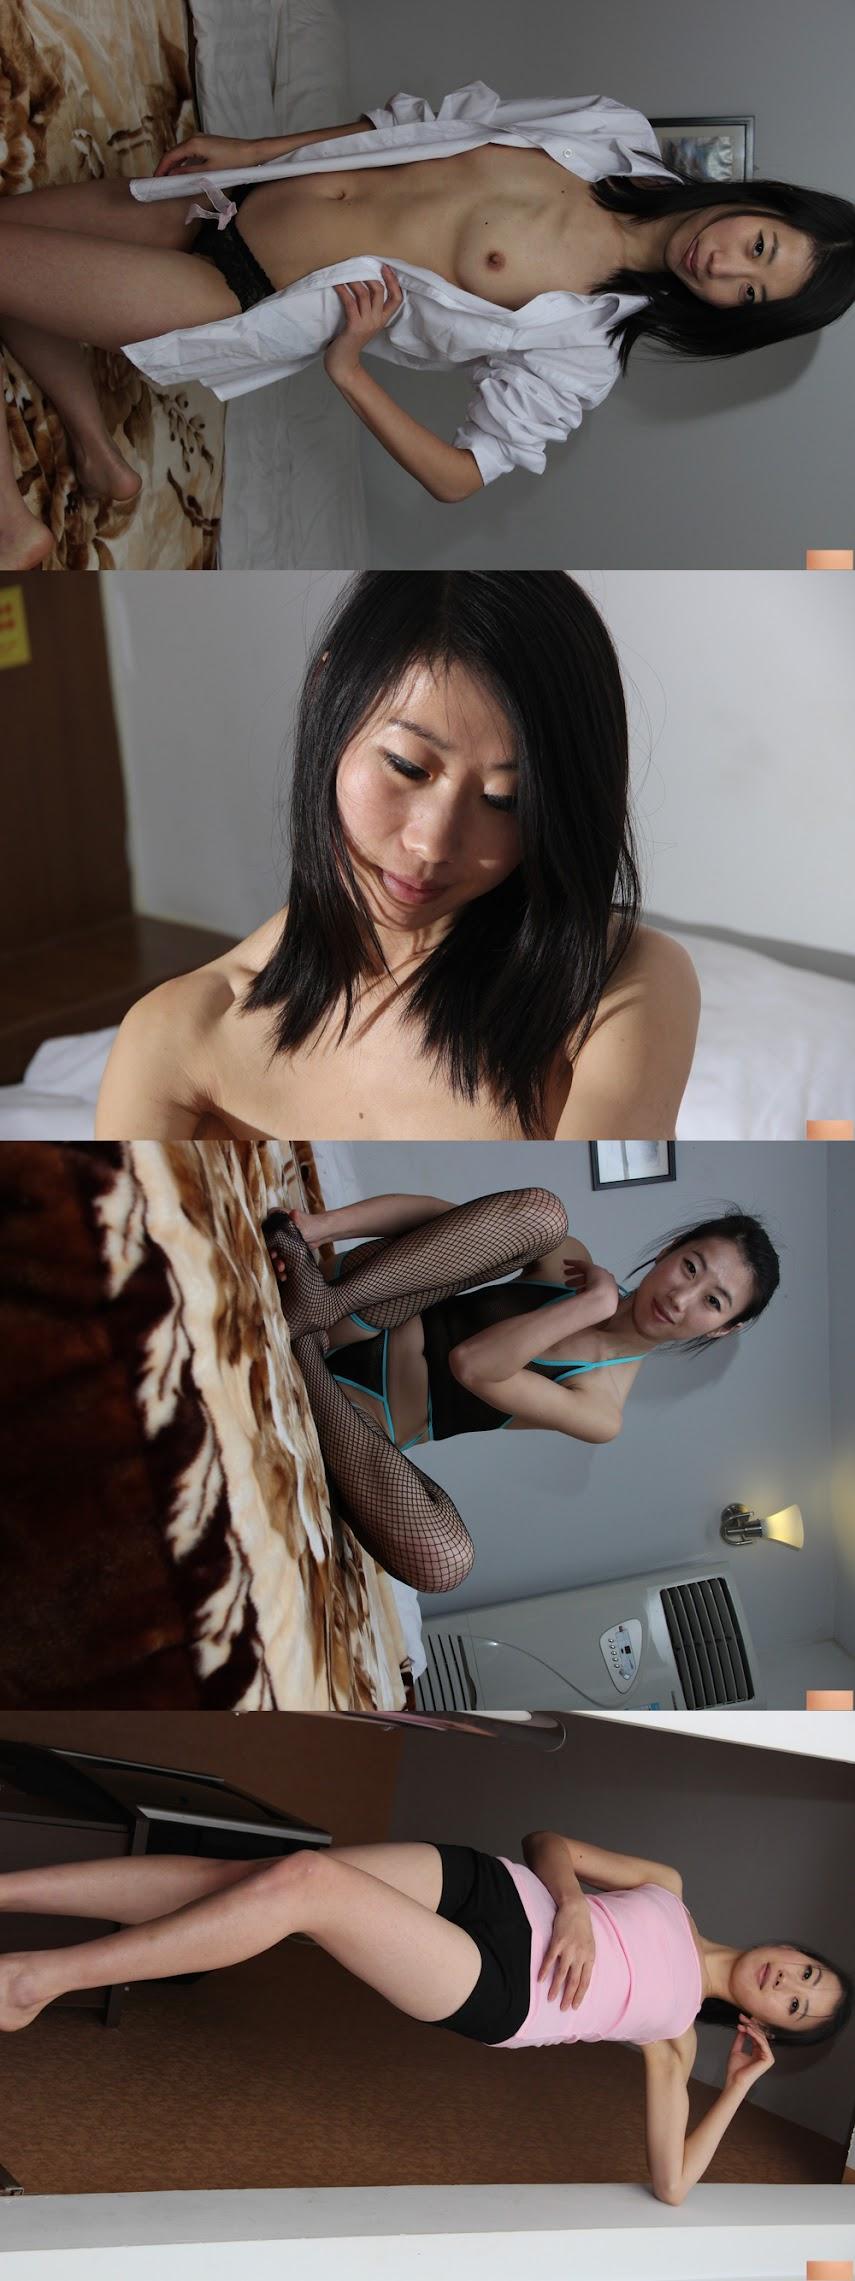 Asian 9038小晴2013.01.02(S).part16